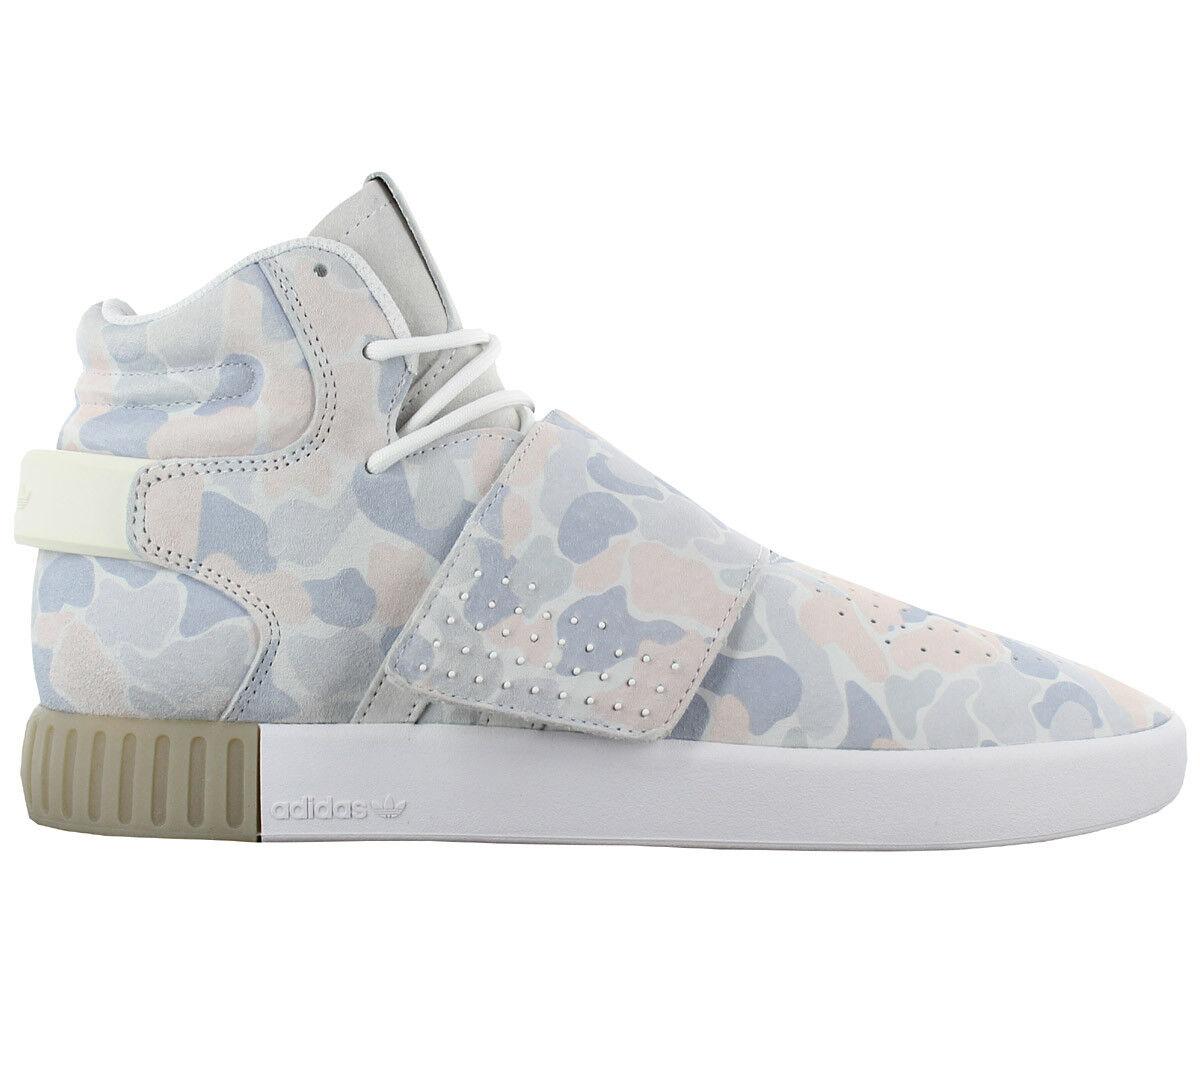 adidas Originals Tubular Instinct Bleu blanc homme chaussures In